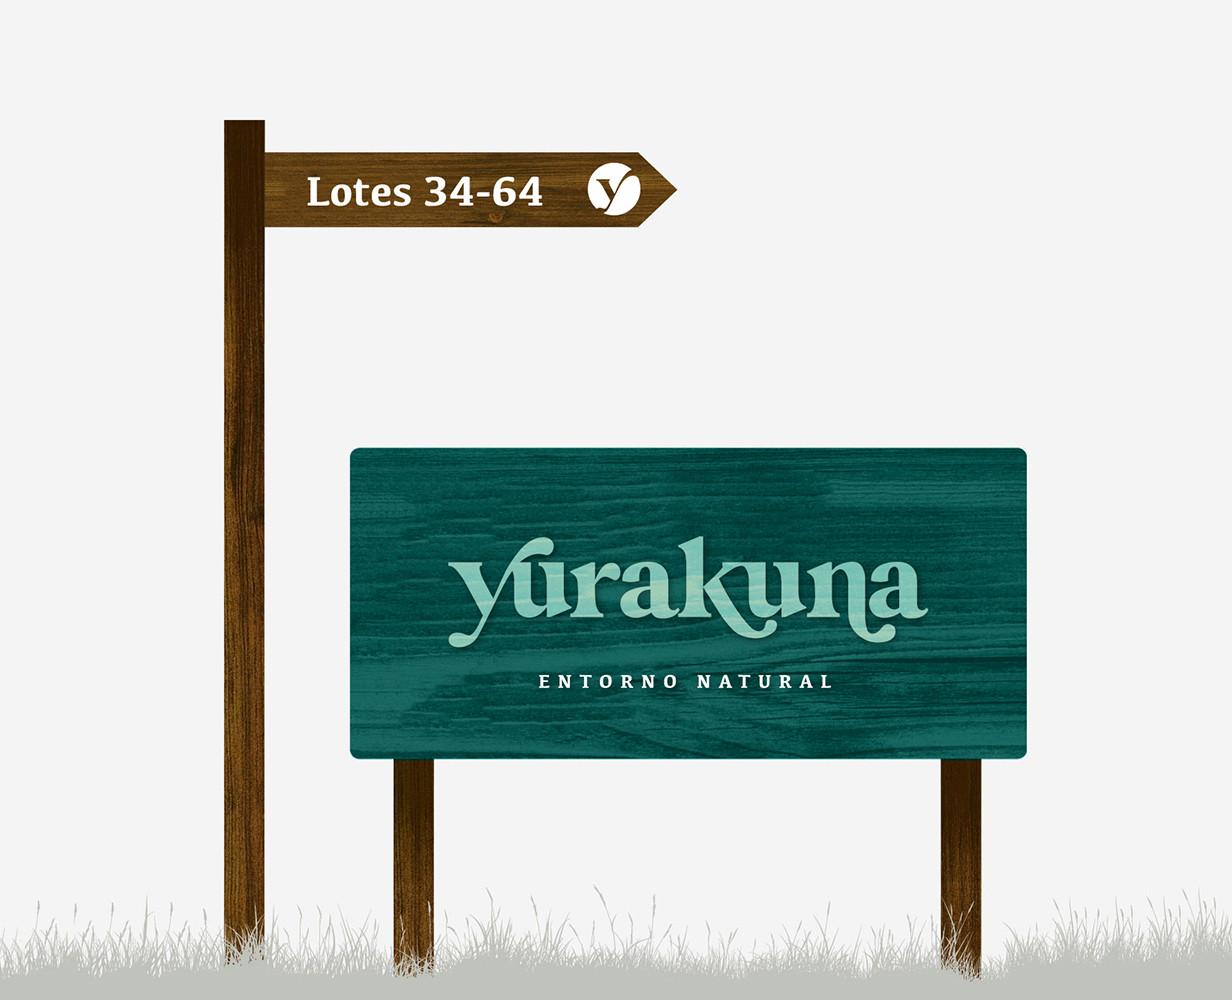 Yurakuna5.jpg